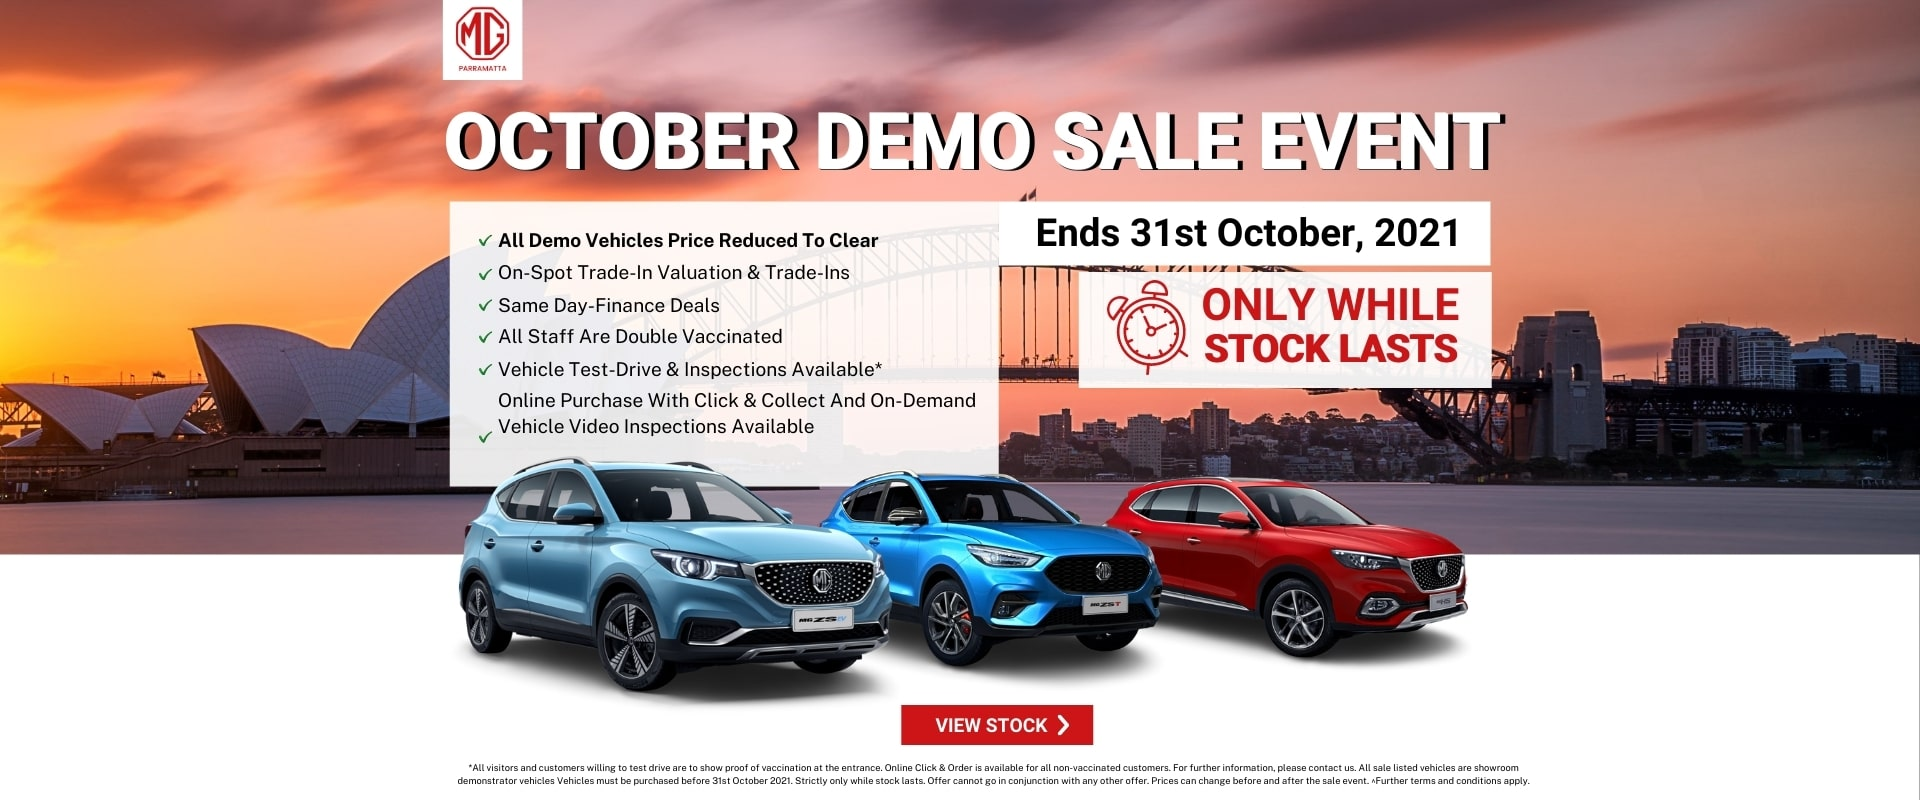 MG Demo Clearance Sale